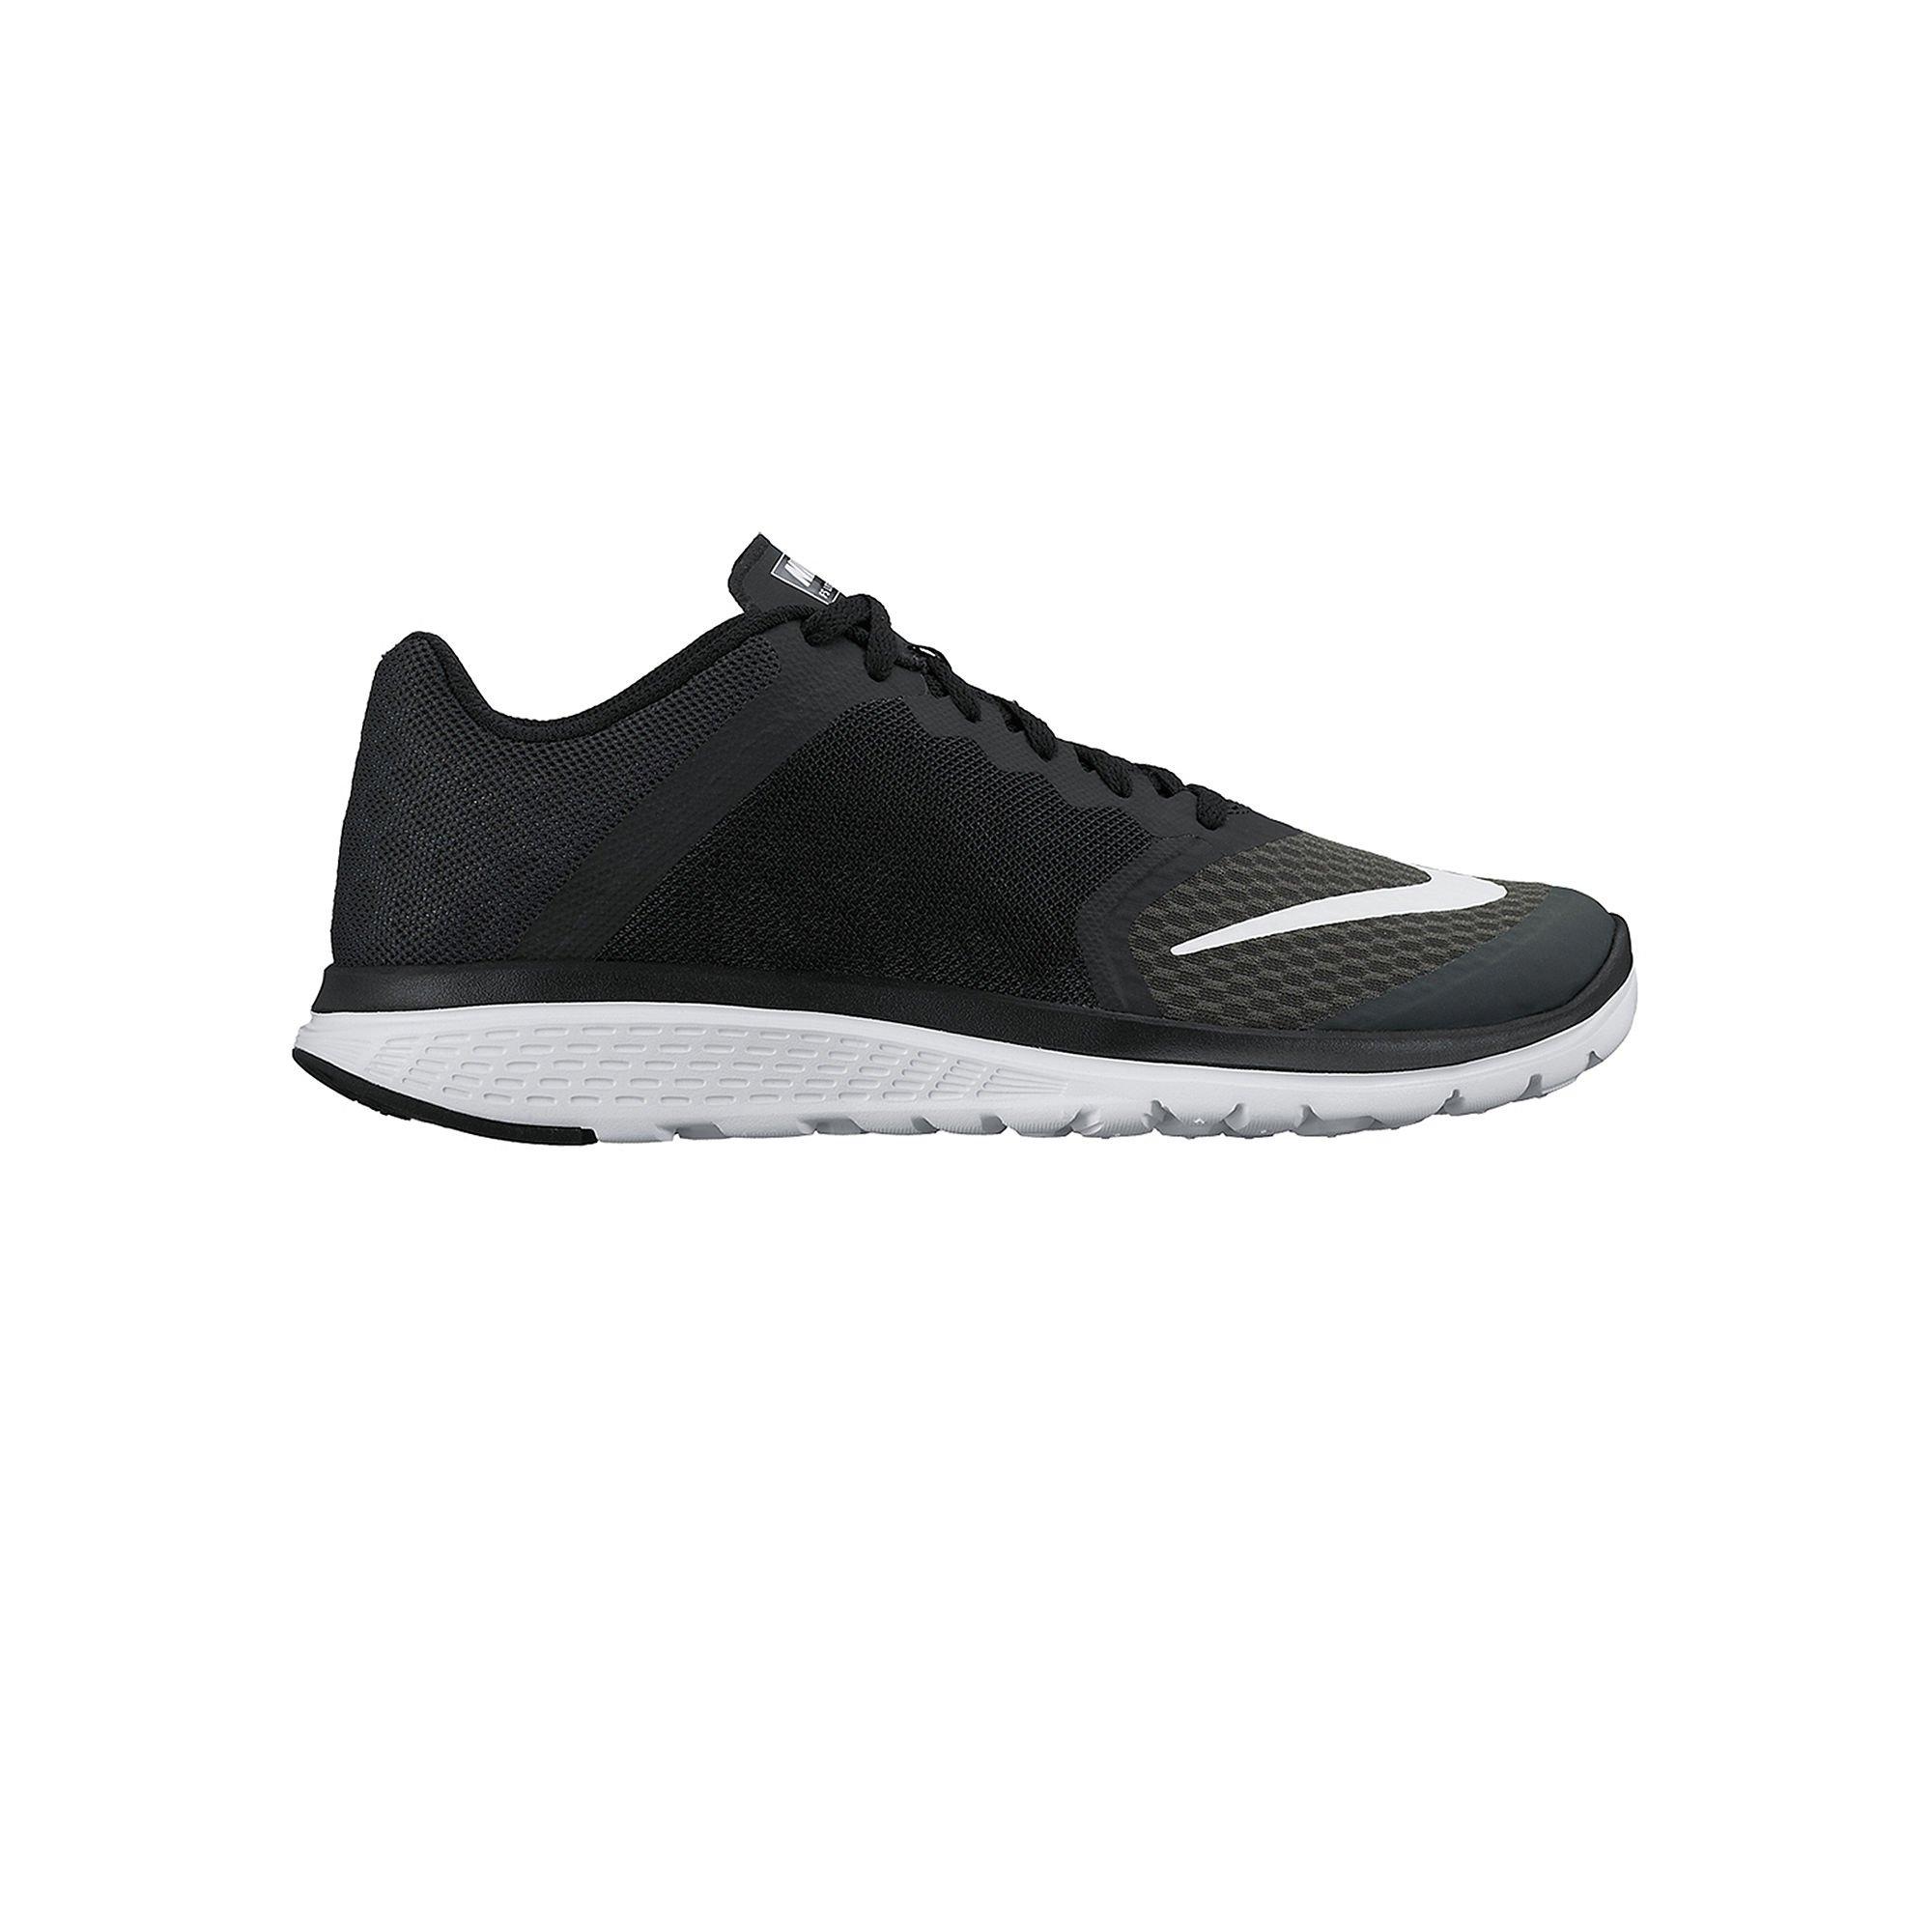 b86ab40bc1647 Galleon - Nike Women s FS Lite Run 3 Running Shoe Anthracite Black White  Size 10 M US